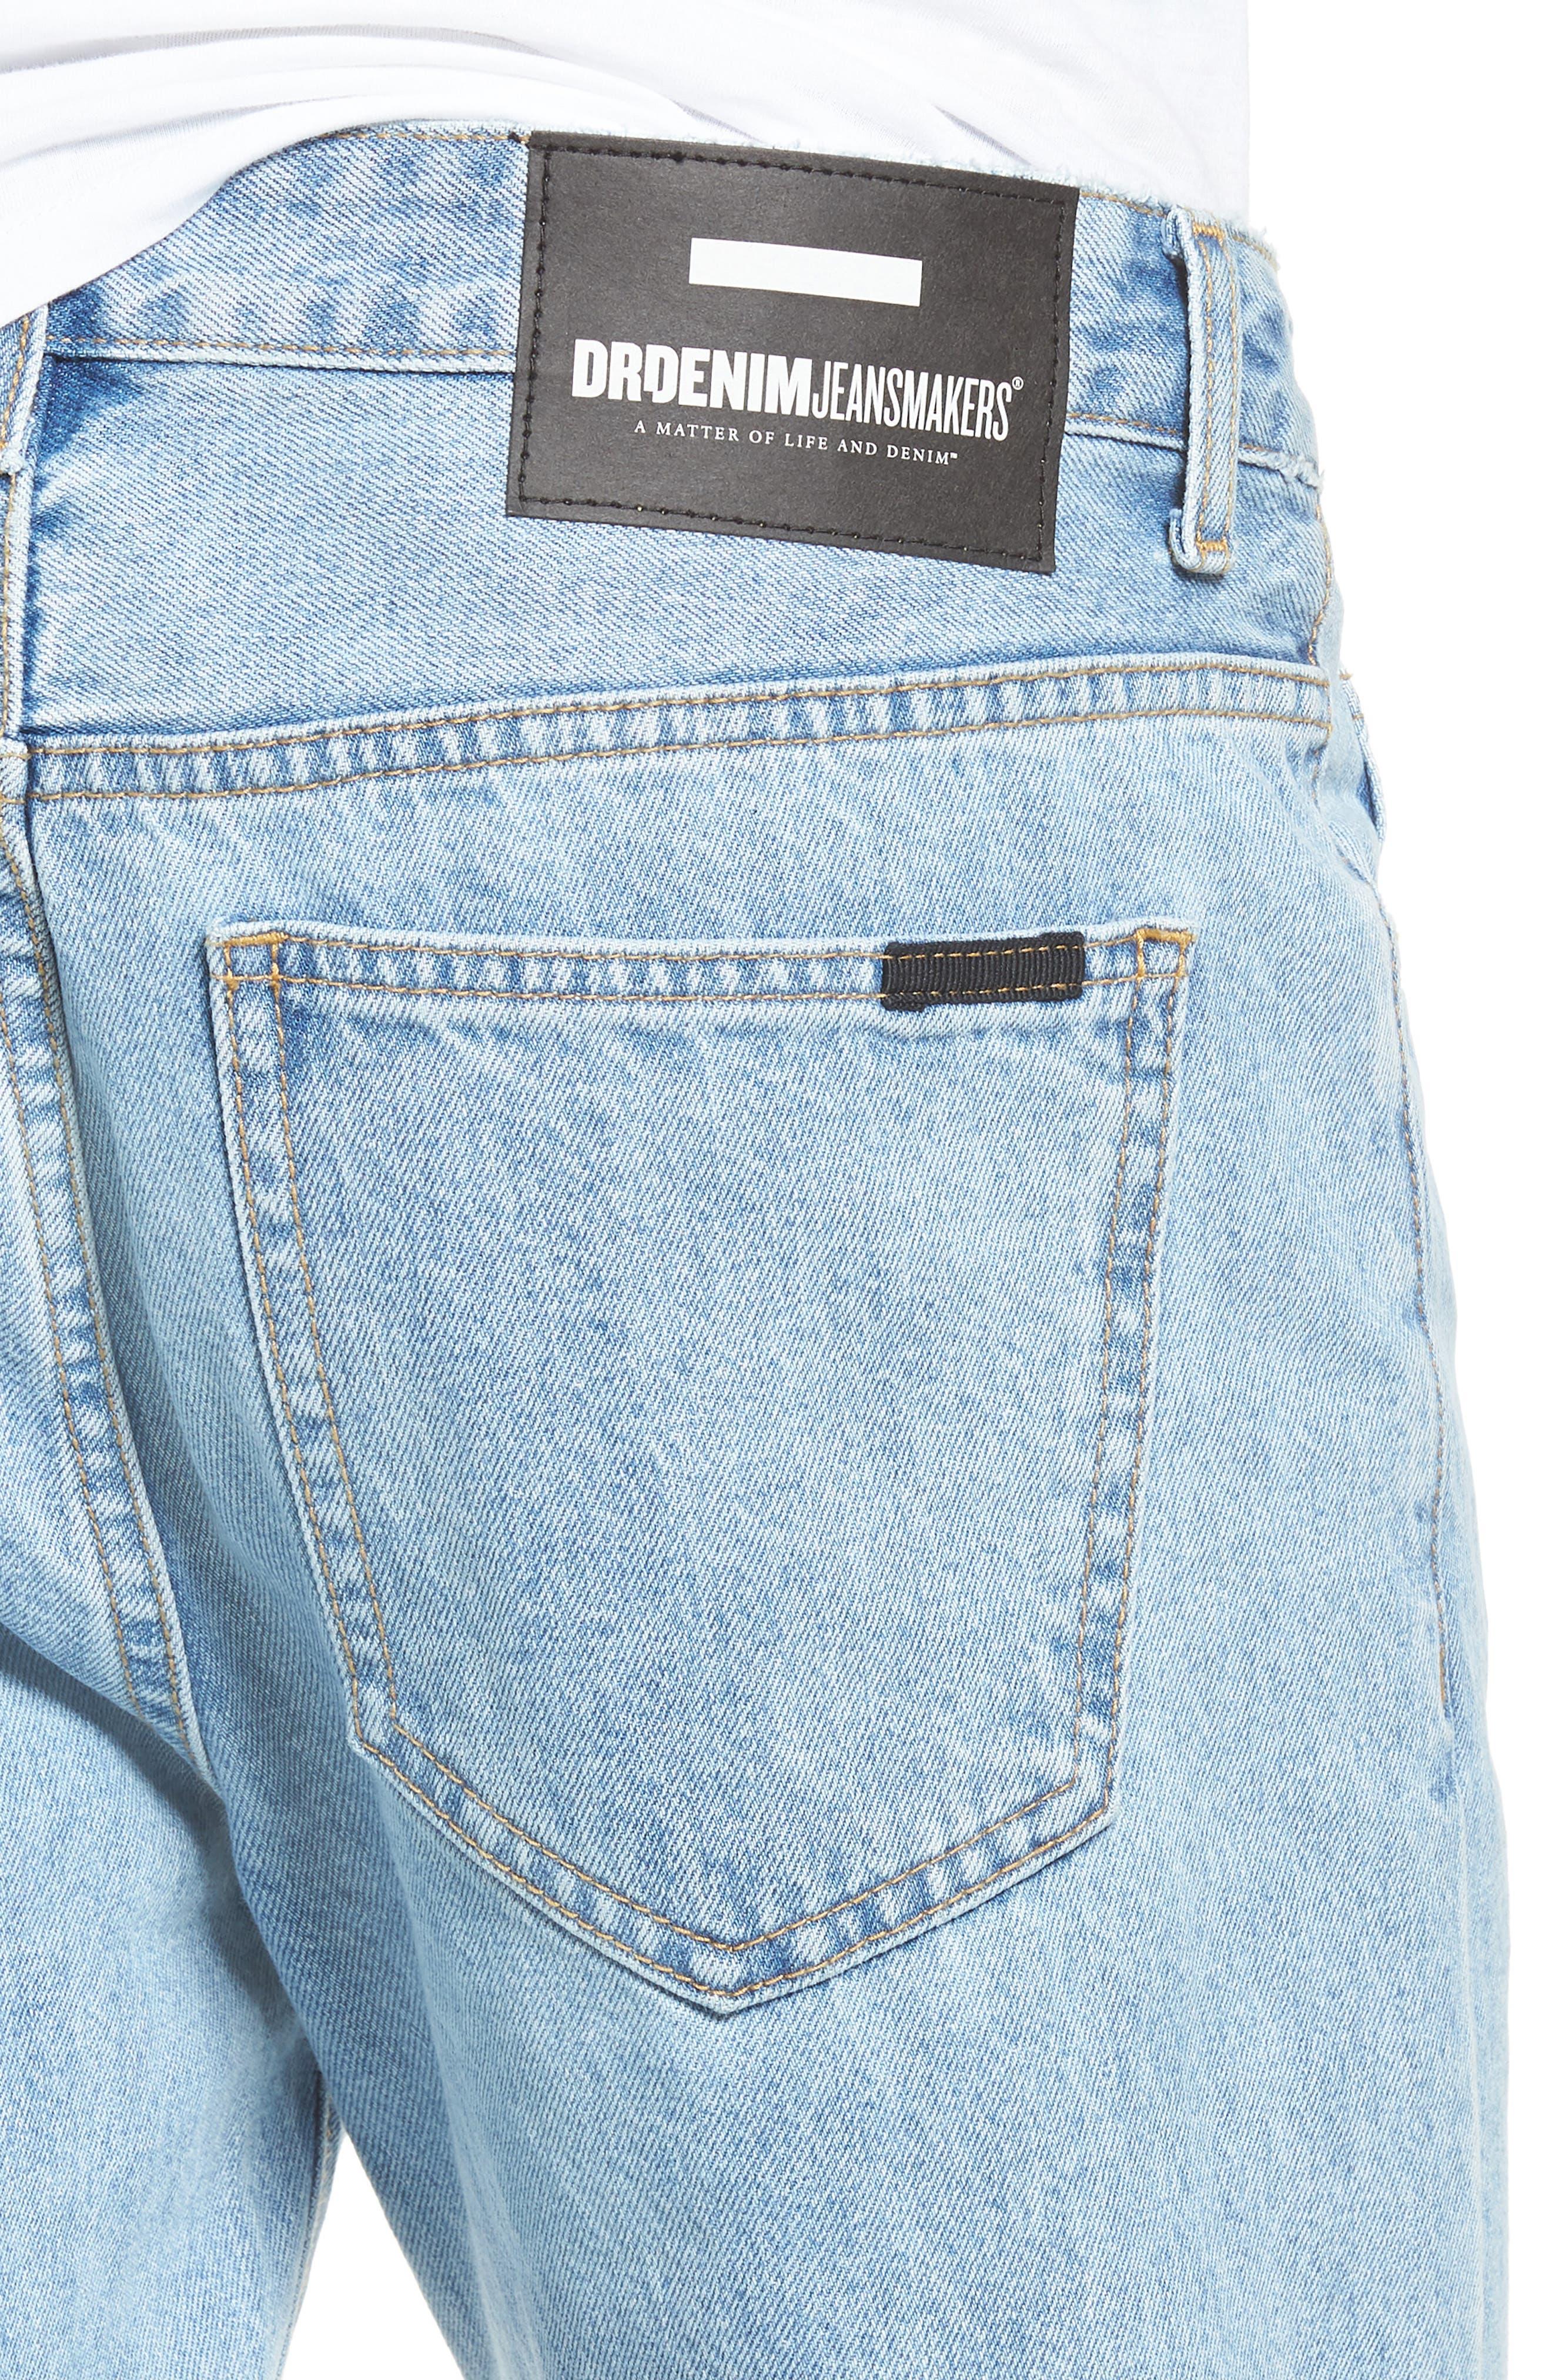 Otis Straight Fit Jeans,                             Alternate thumbnail 4, color,                             400